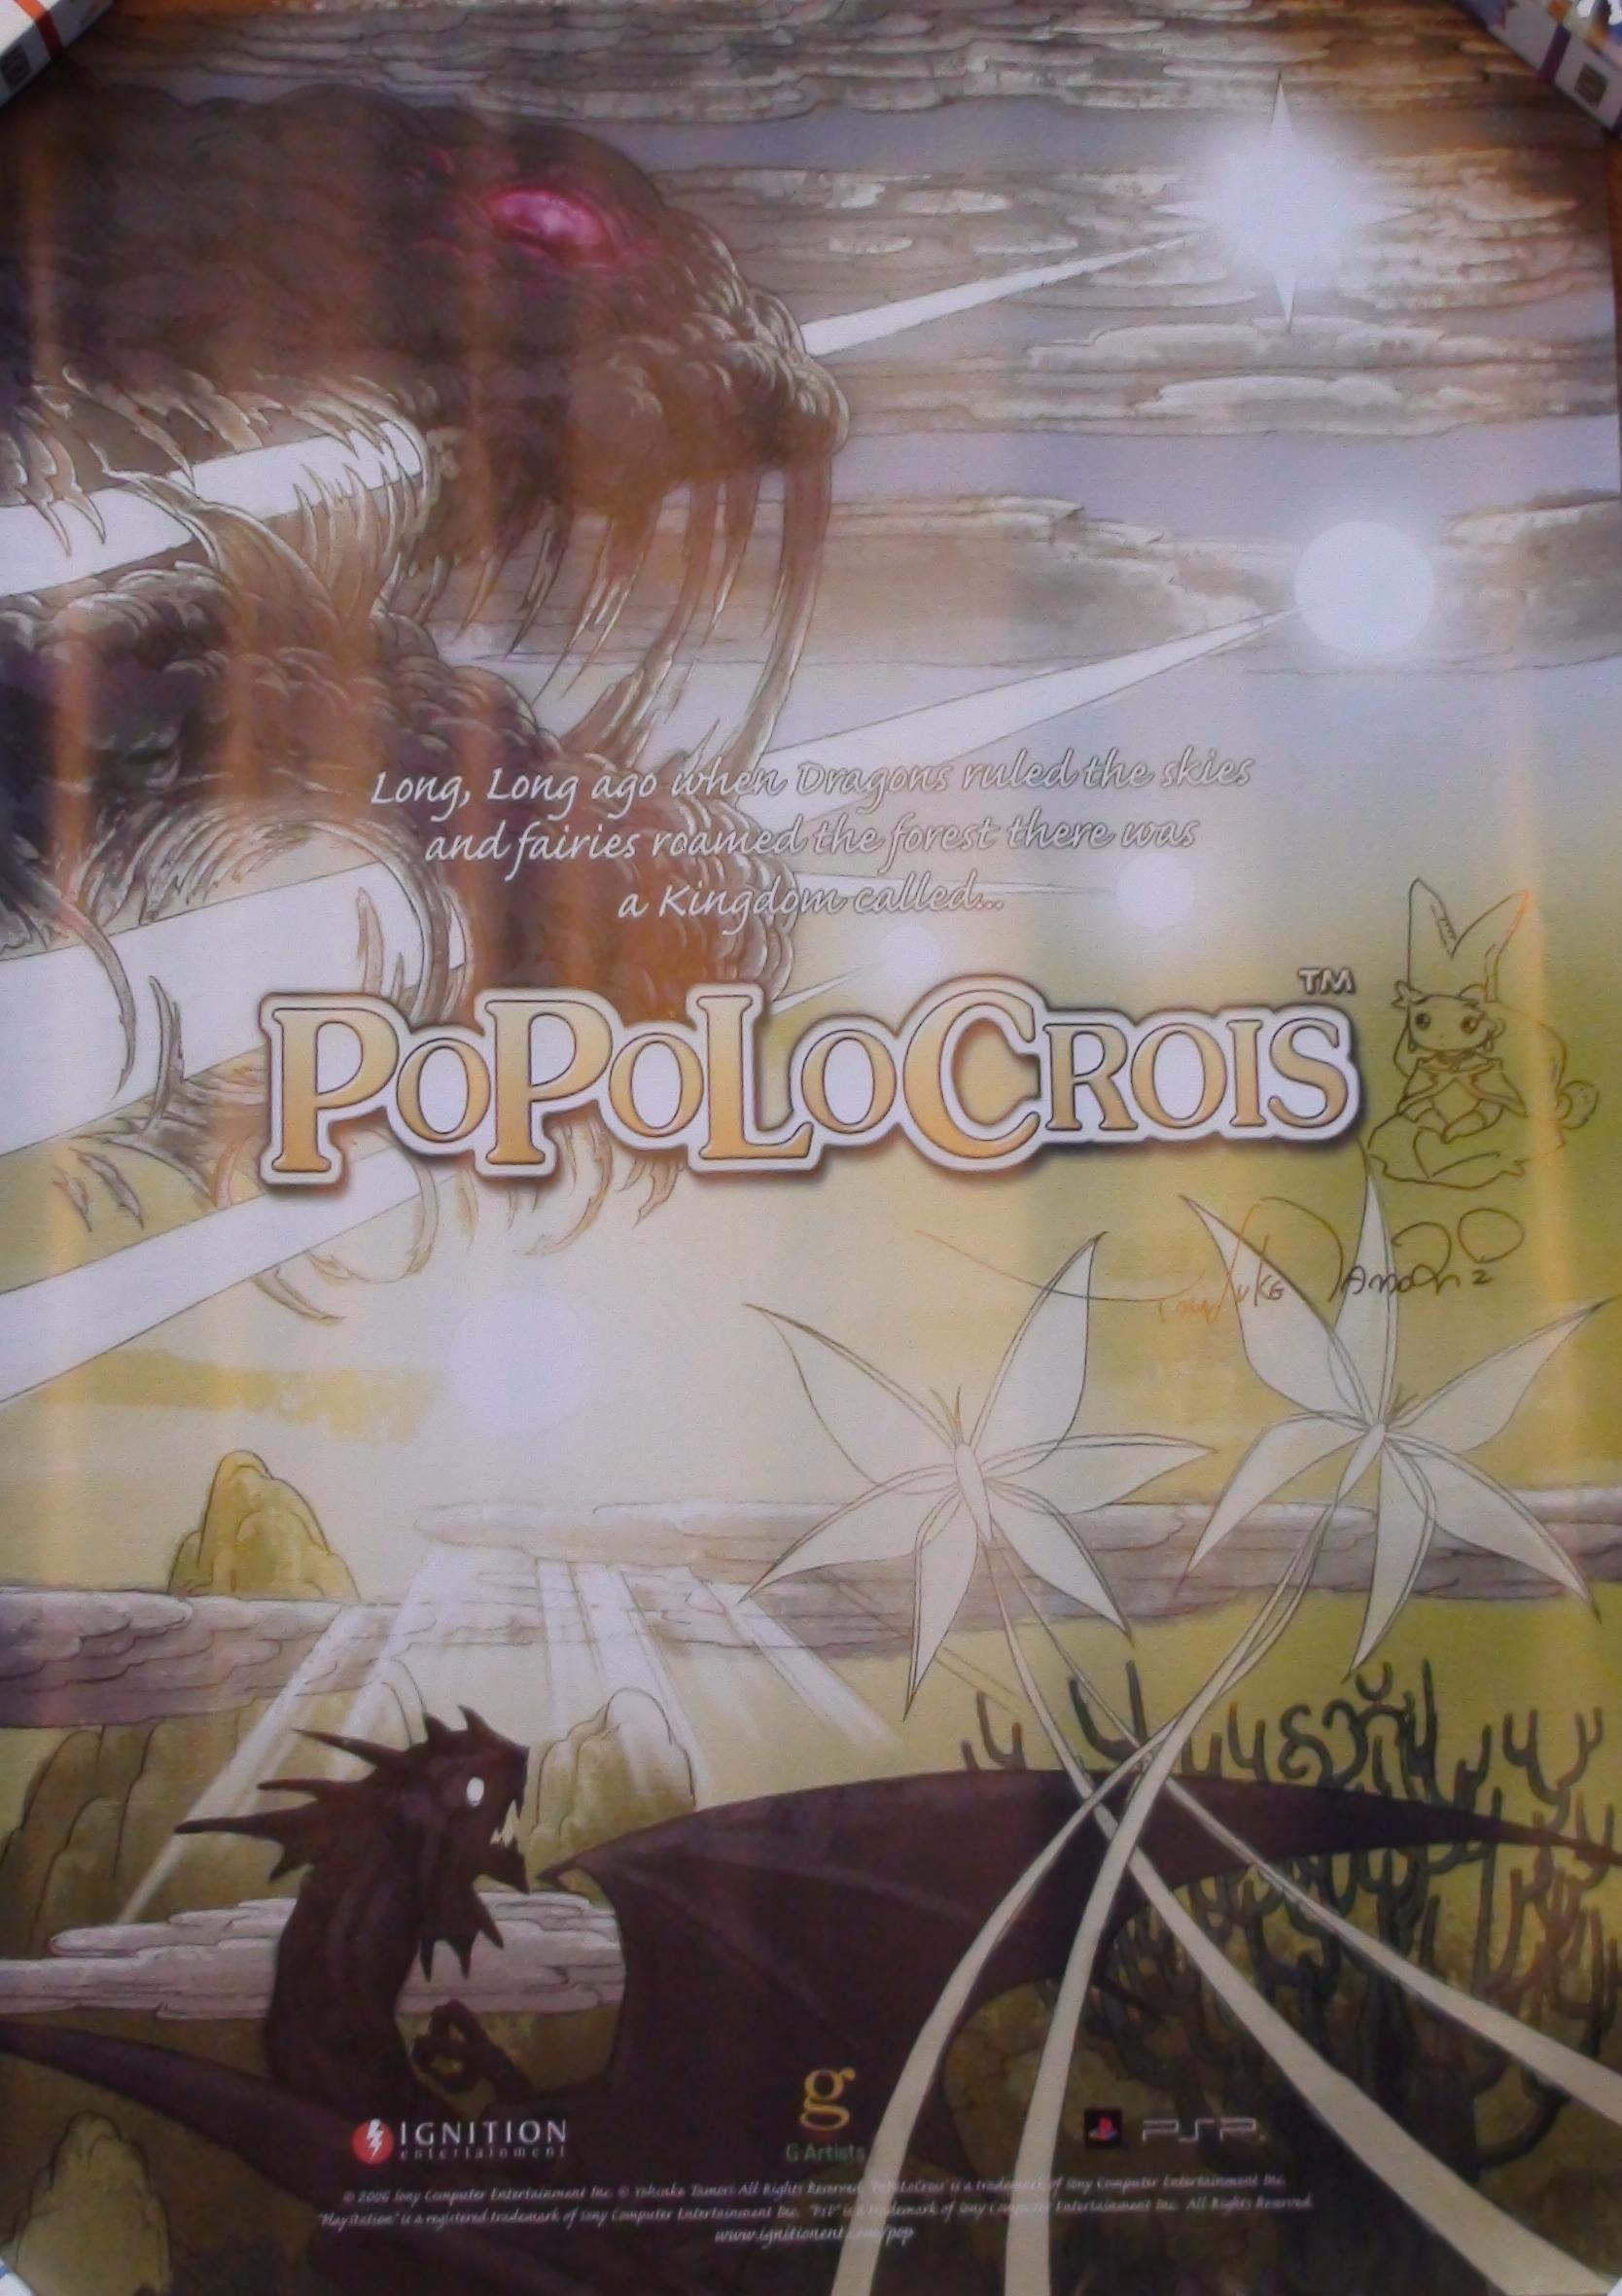 Popolocrois - Tamori Yousuke